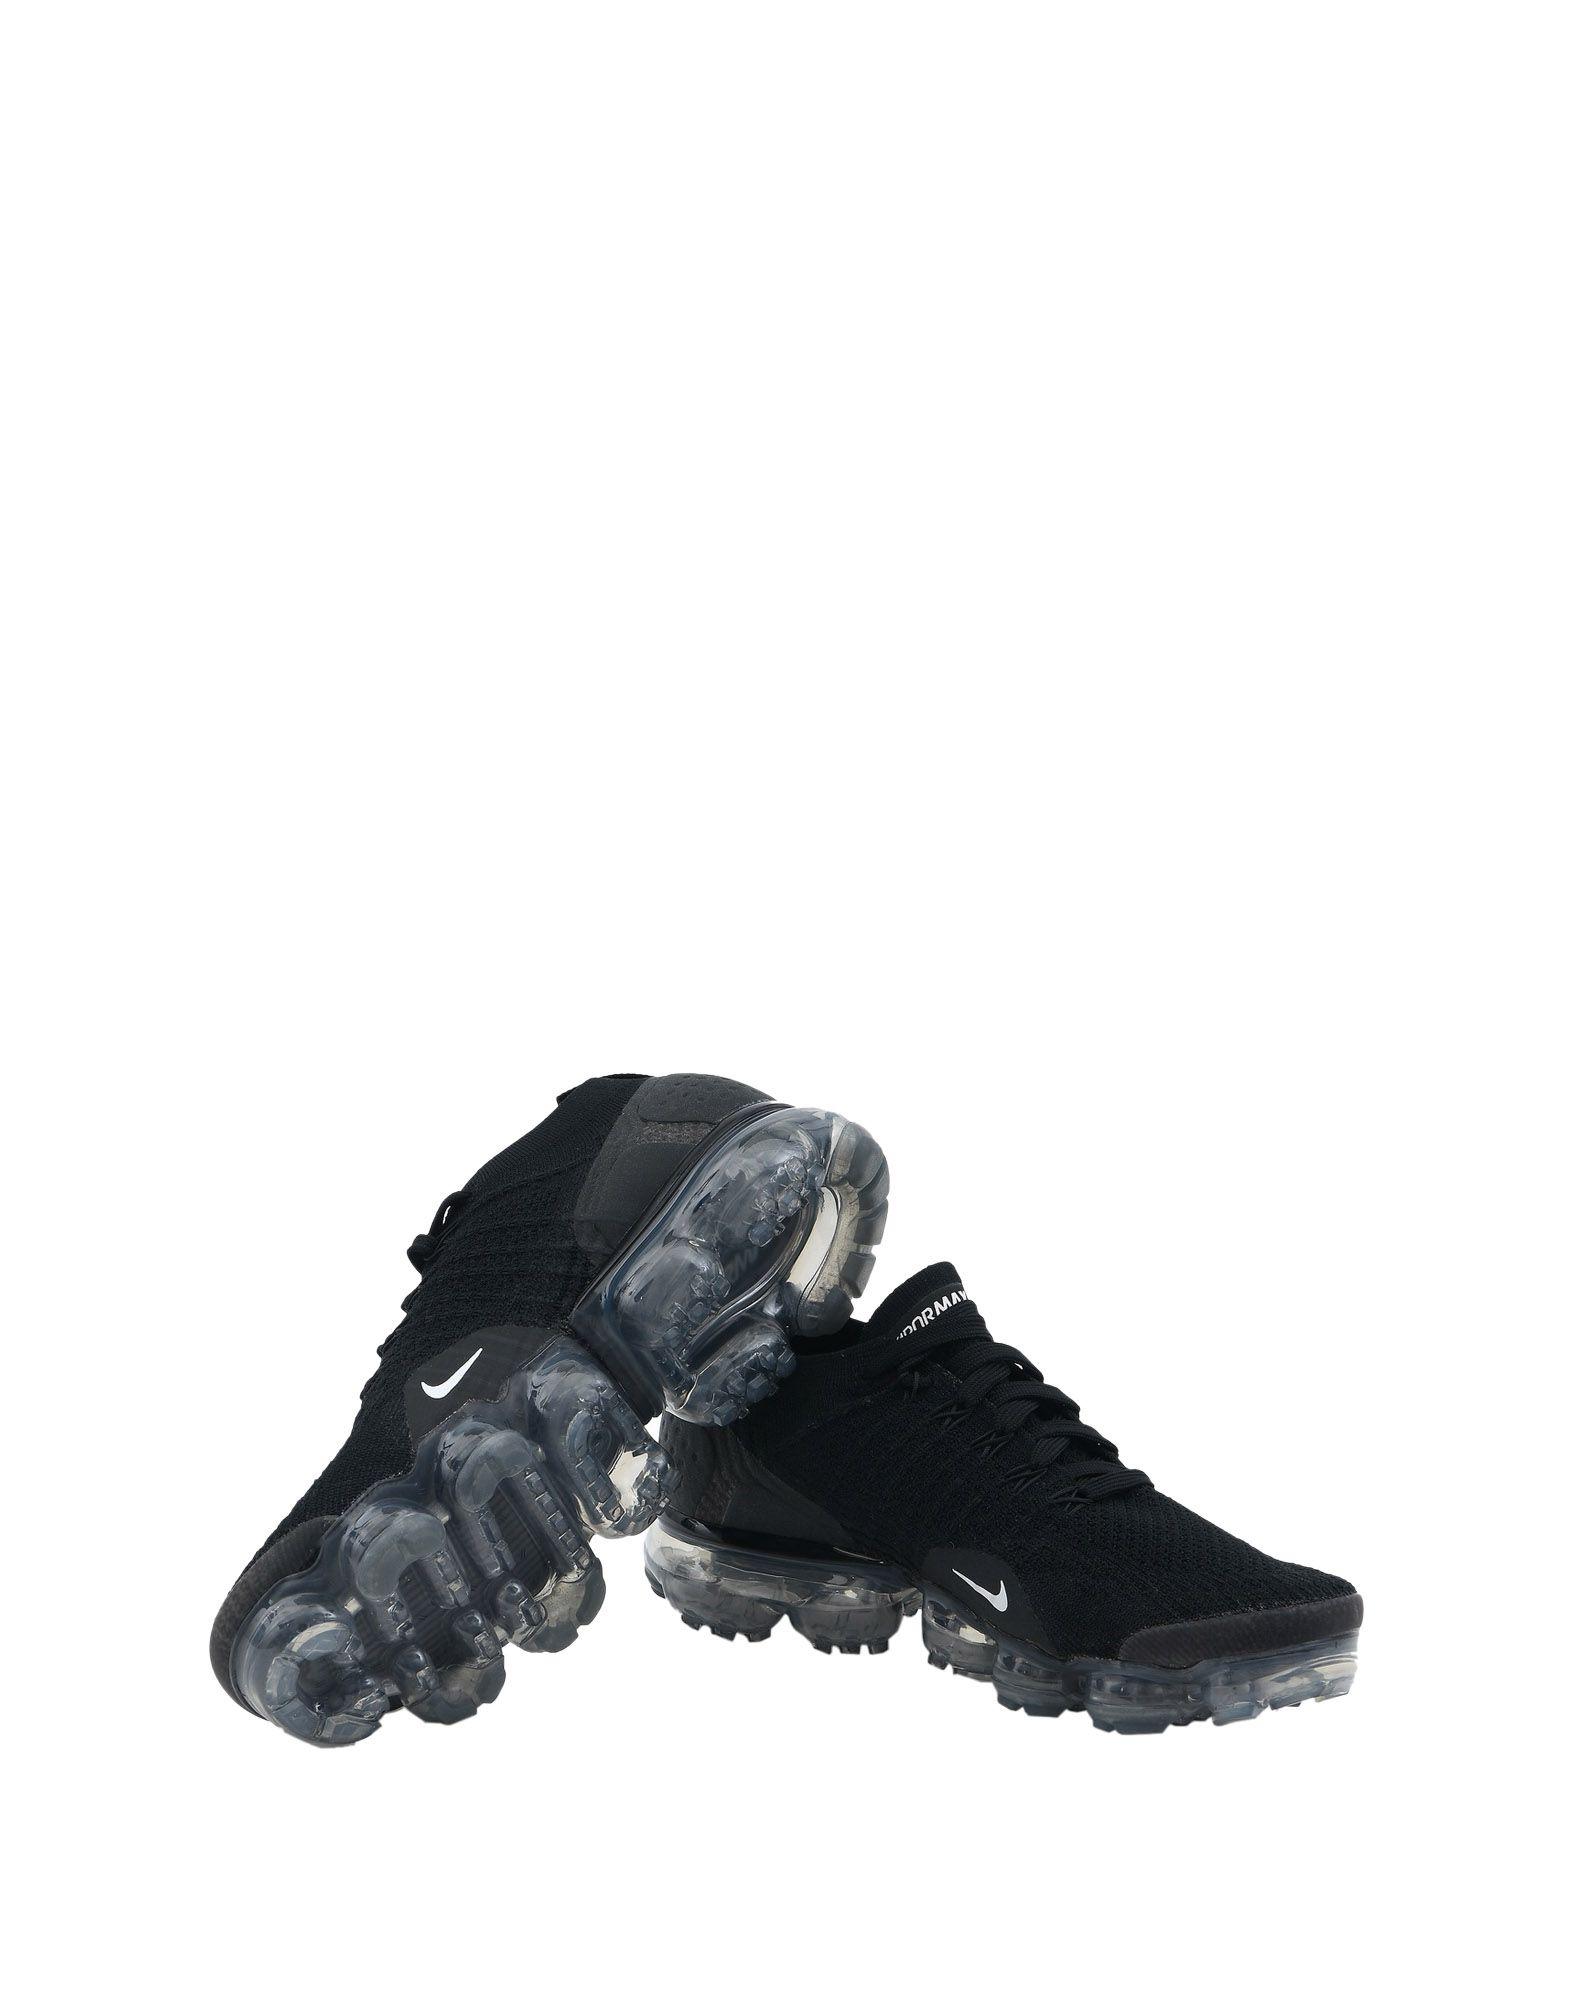 Nike W Nike Air Vapormax Flyknit 2 - Sneakers Sneakers Sneakers - Women Nike Sneakers online on  United Kingdom - 11481192OH 553275